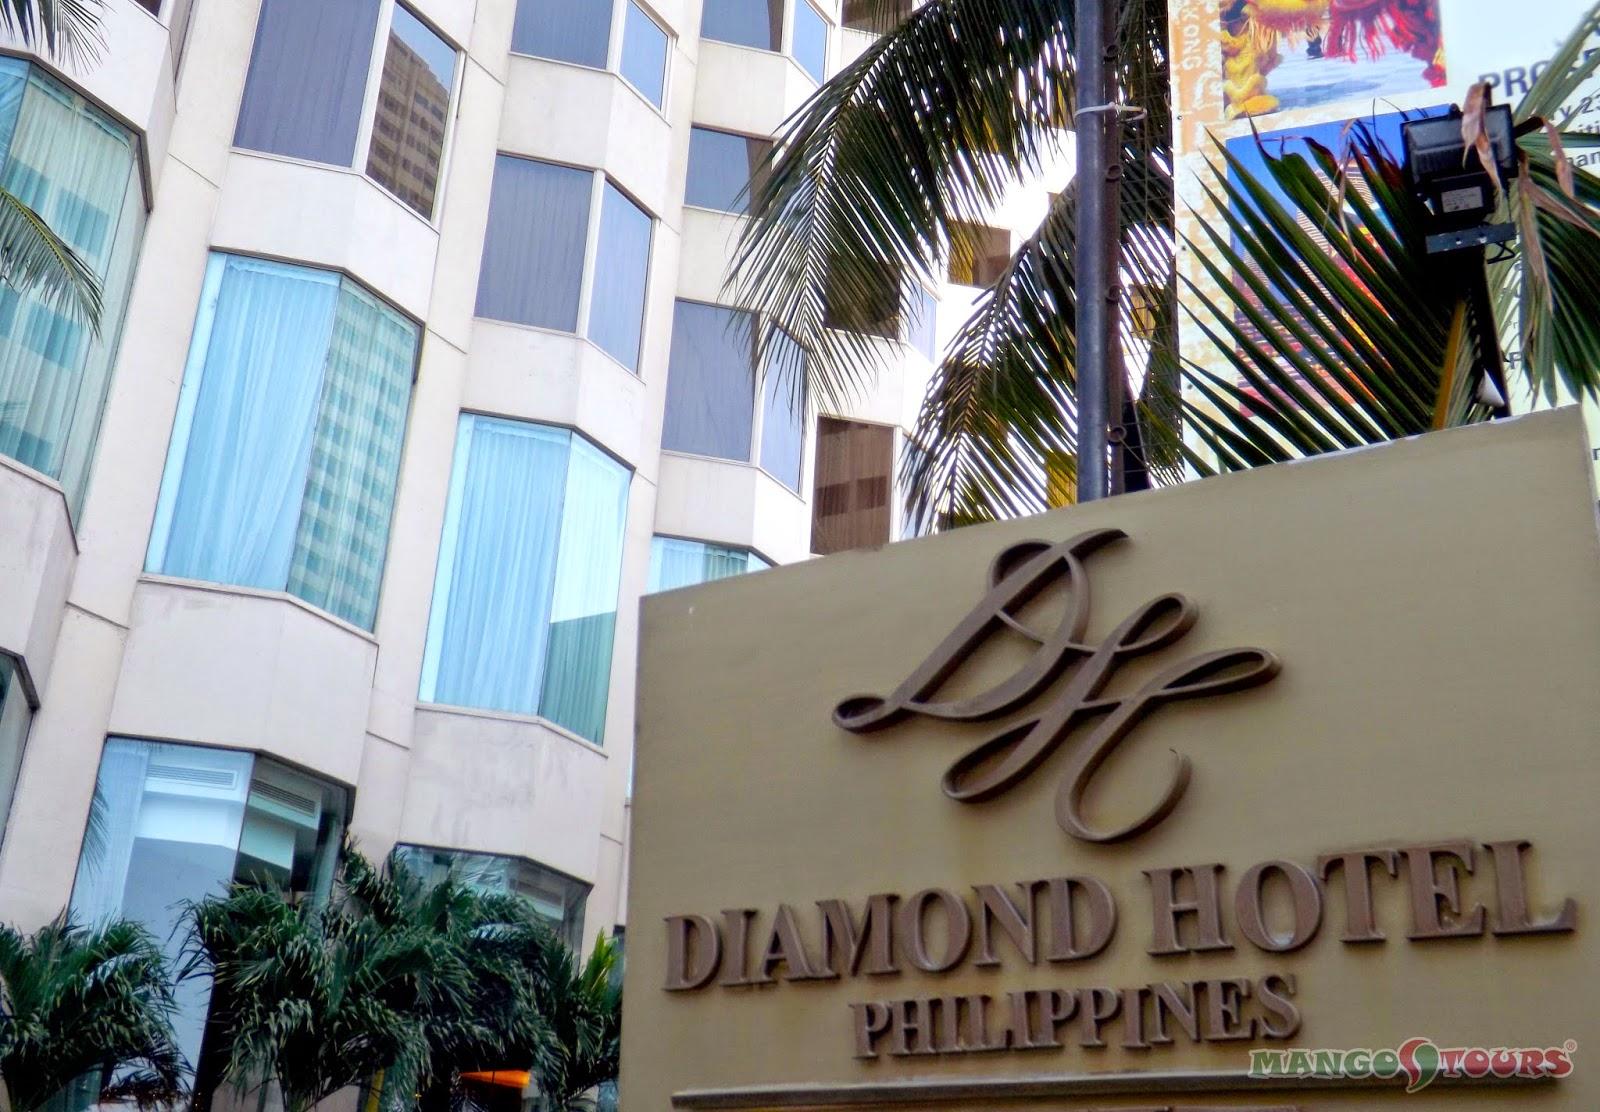 Mango Tours Diamond Hotel Philippines